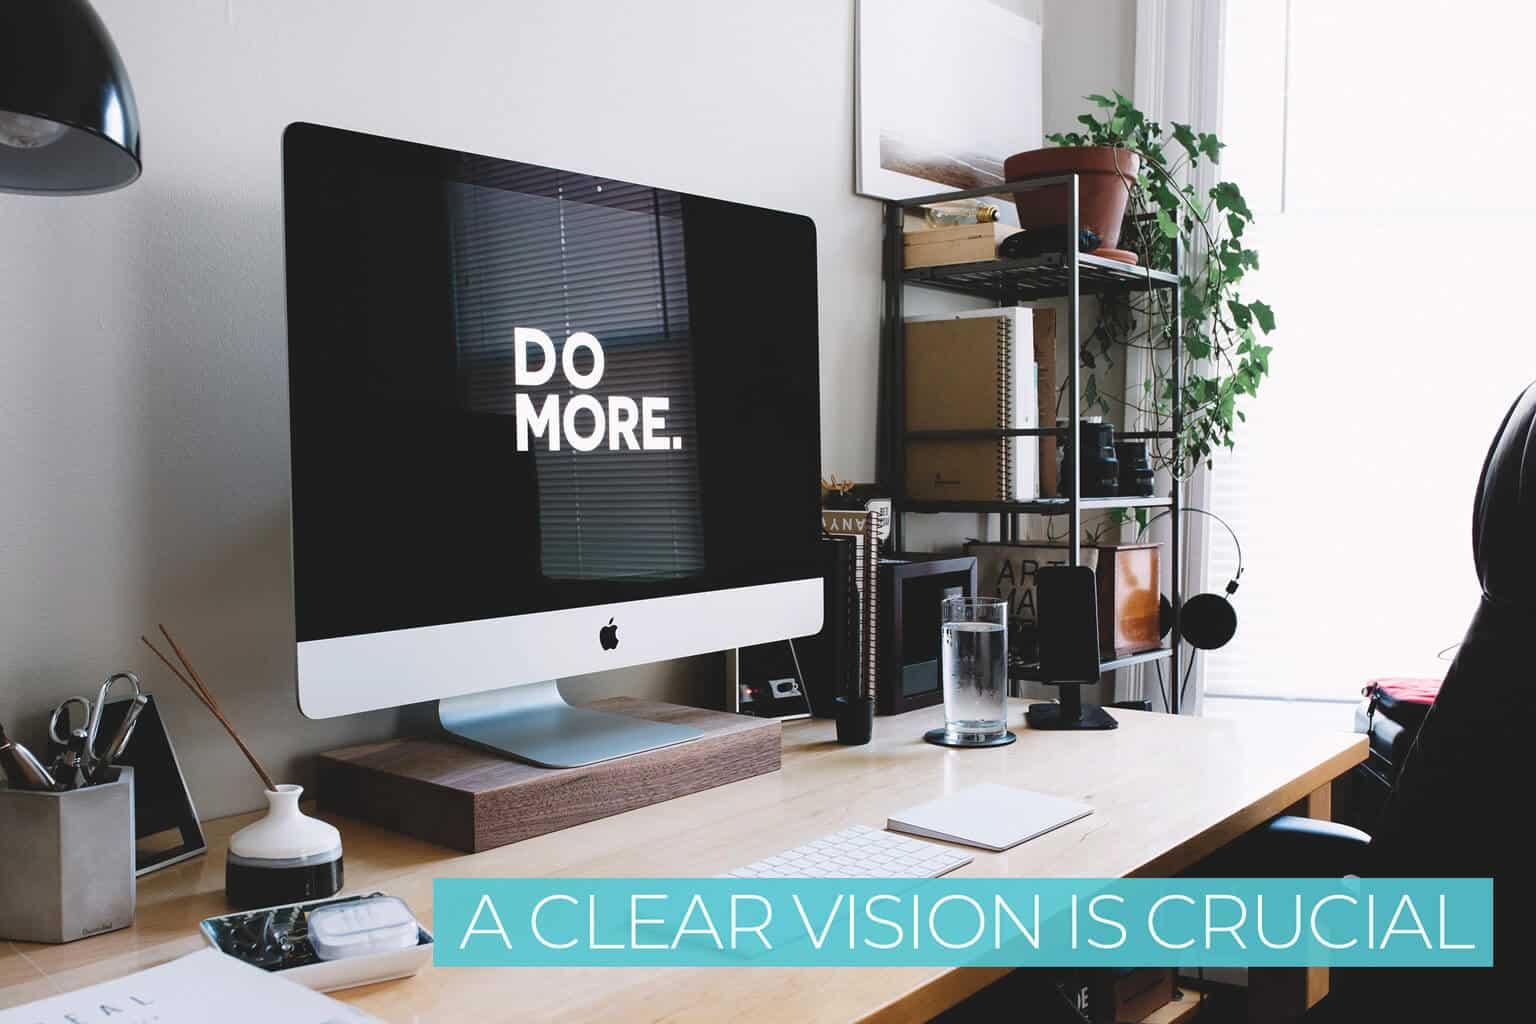 Achieve your dreams through clarity